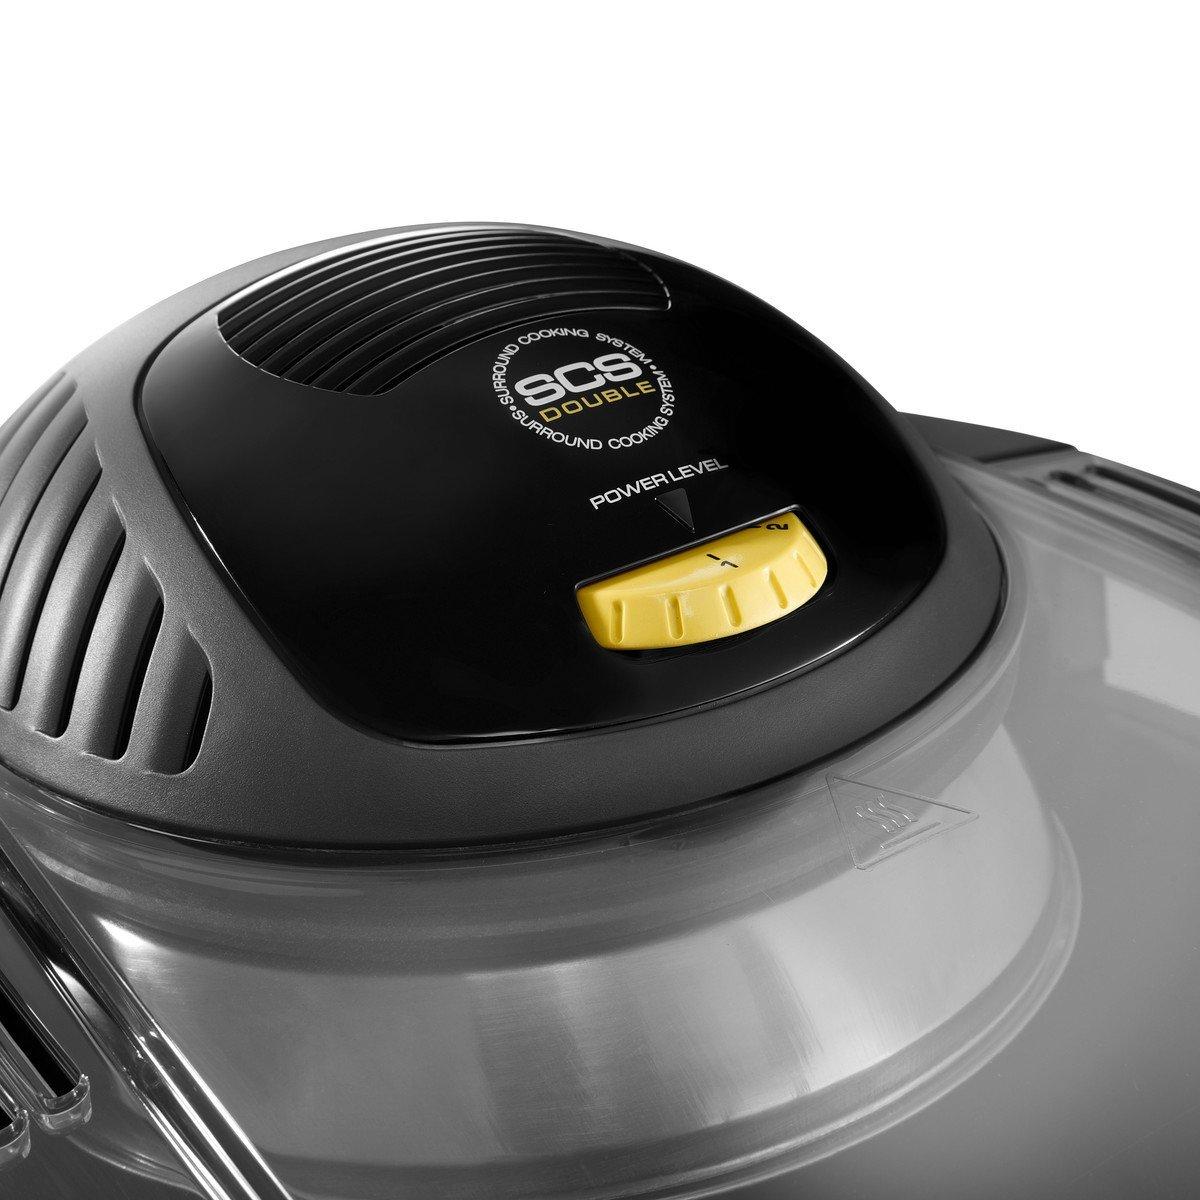 De Longhi Fh1163 Multifry Air Fryer And Multi Cooker Best